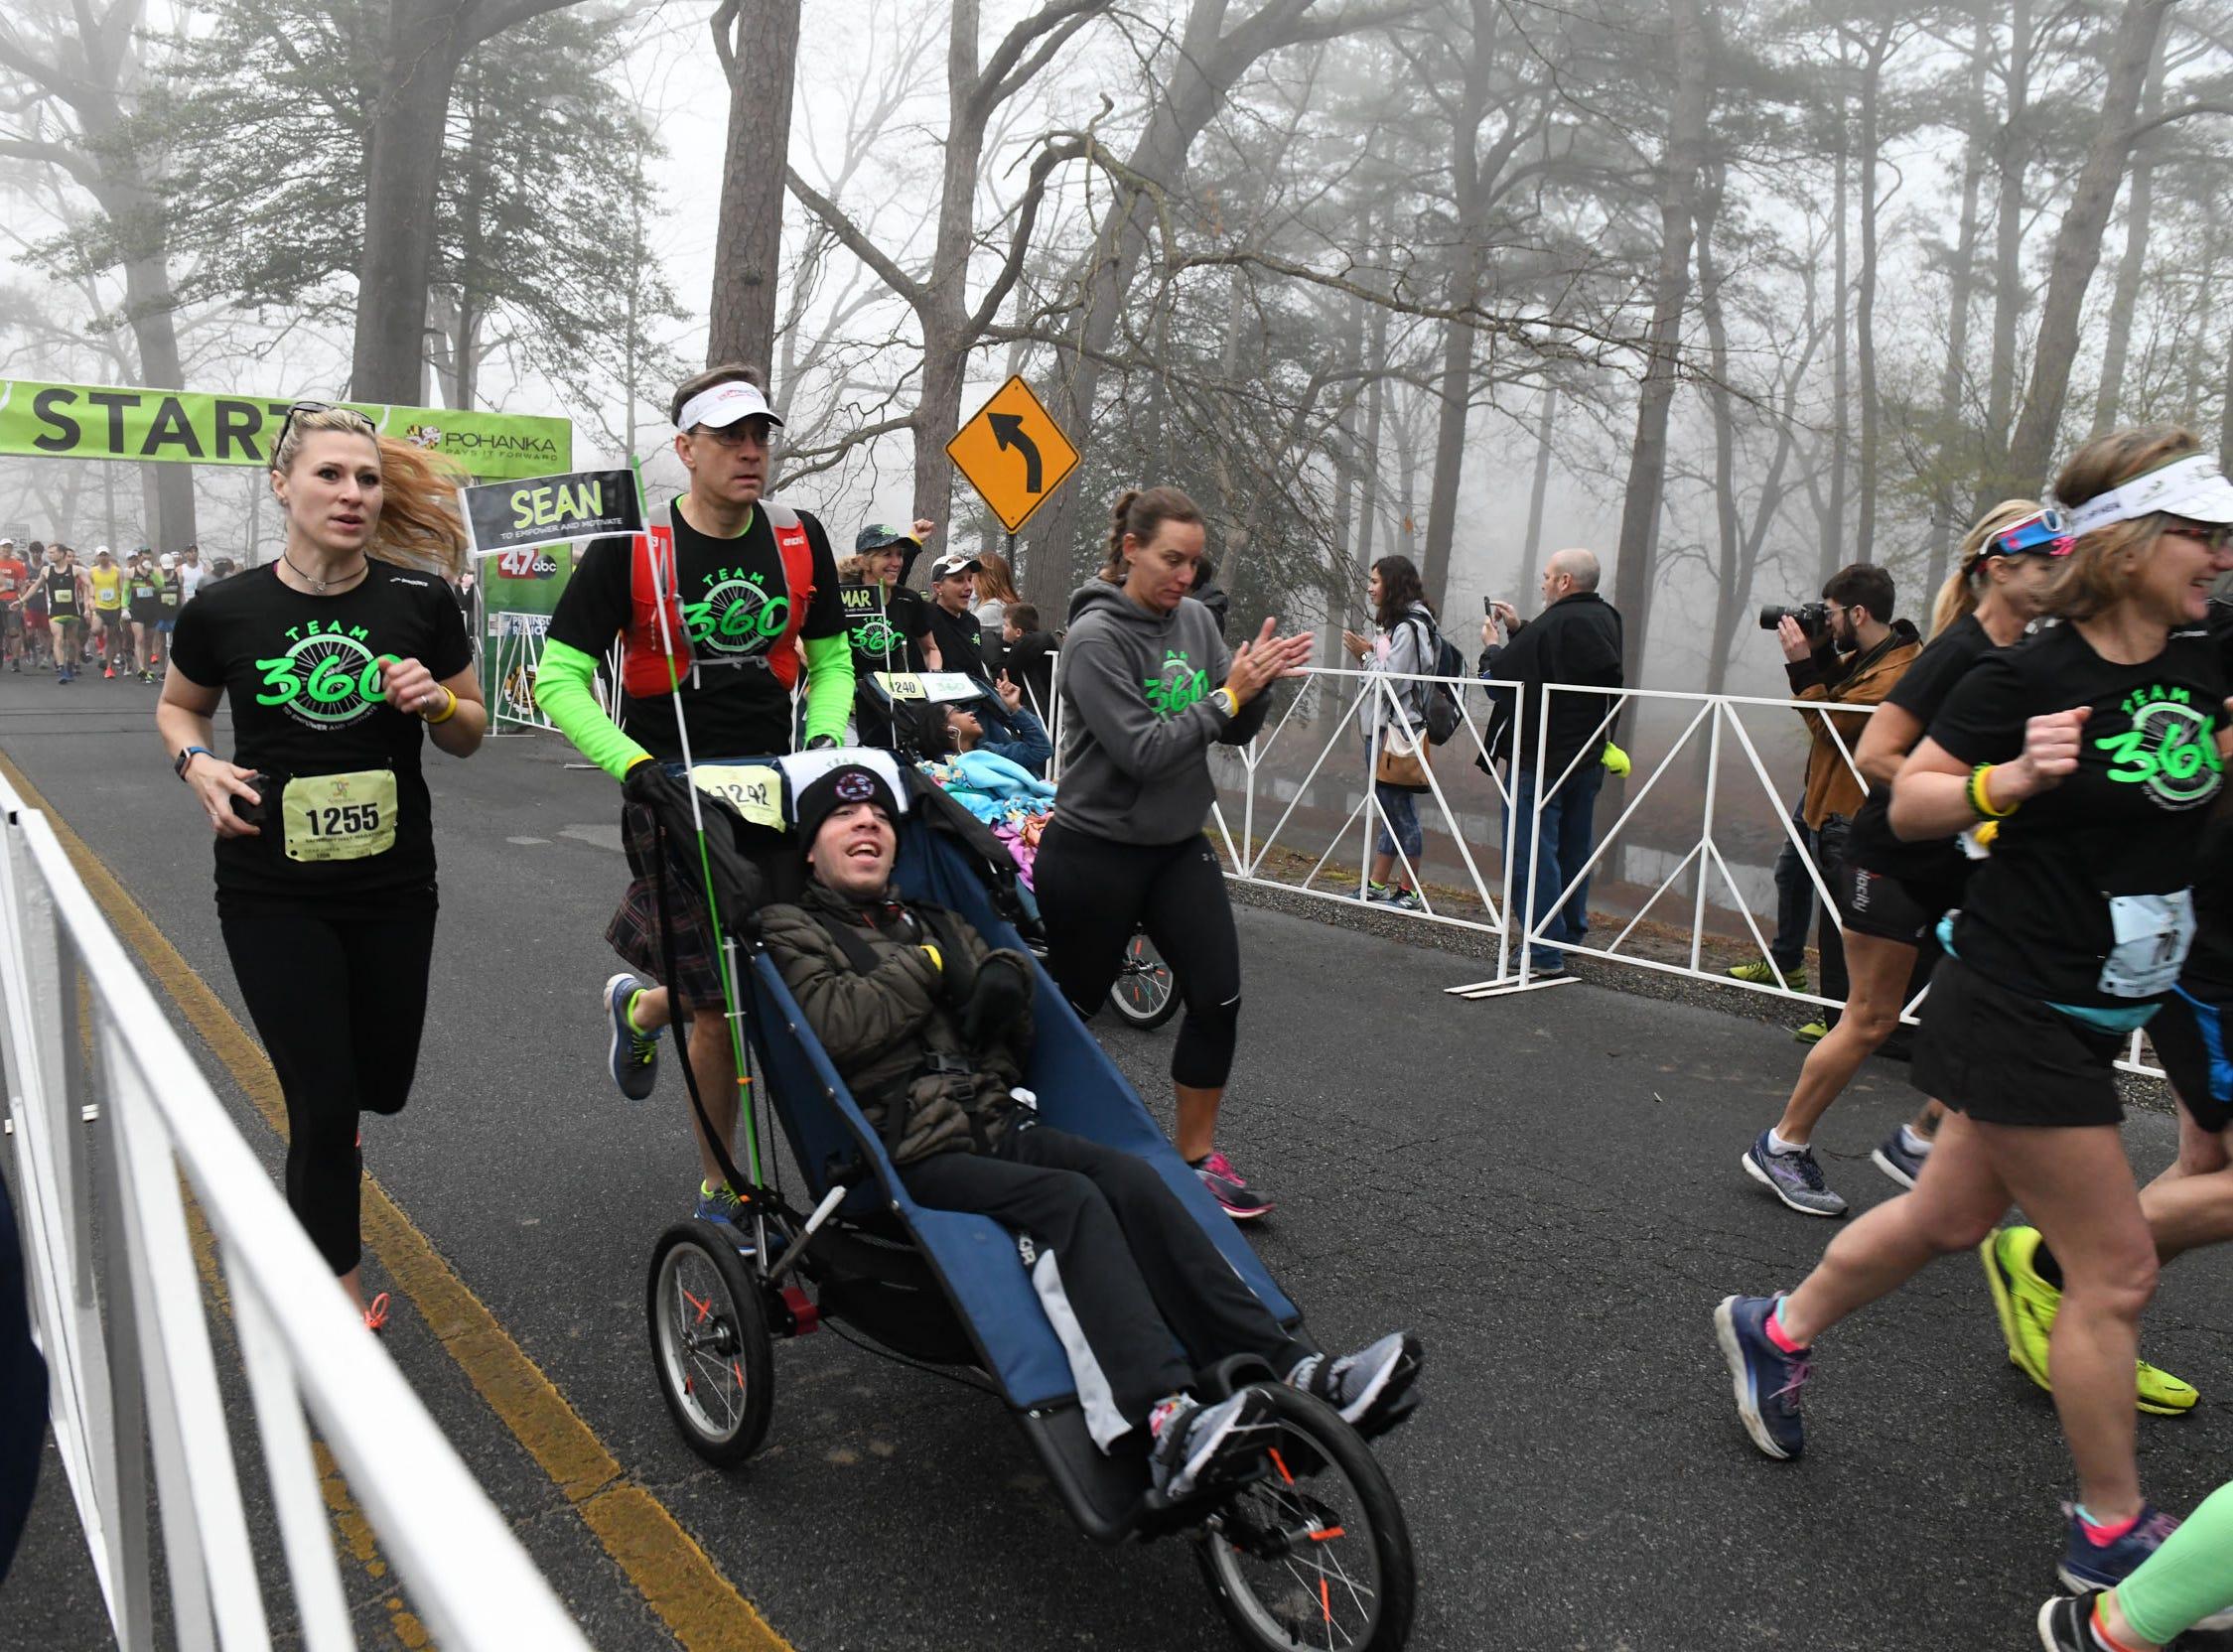 Team 360 starts the 2nd Salisbury Marathon/ Half Marathon/ 5k kicked off Saturday, April 6, 2019 at the City Park.